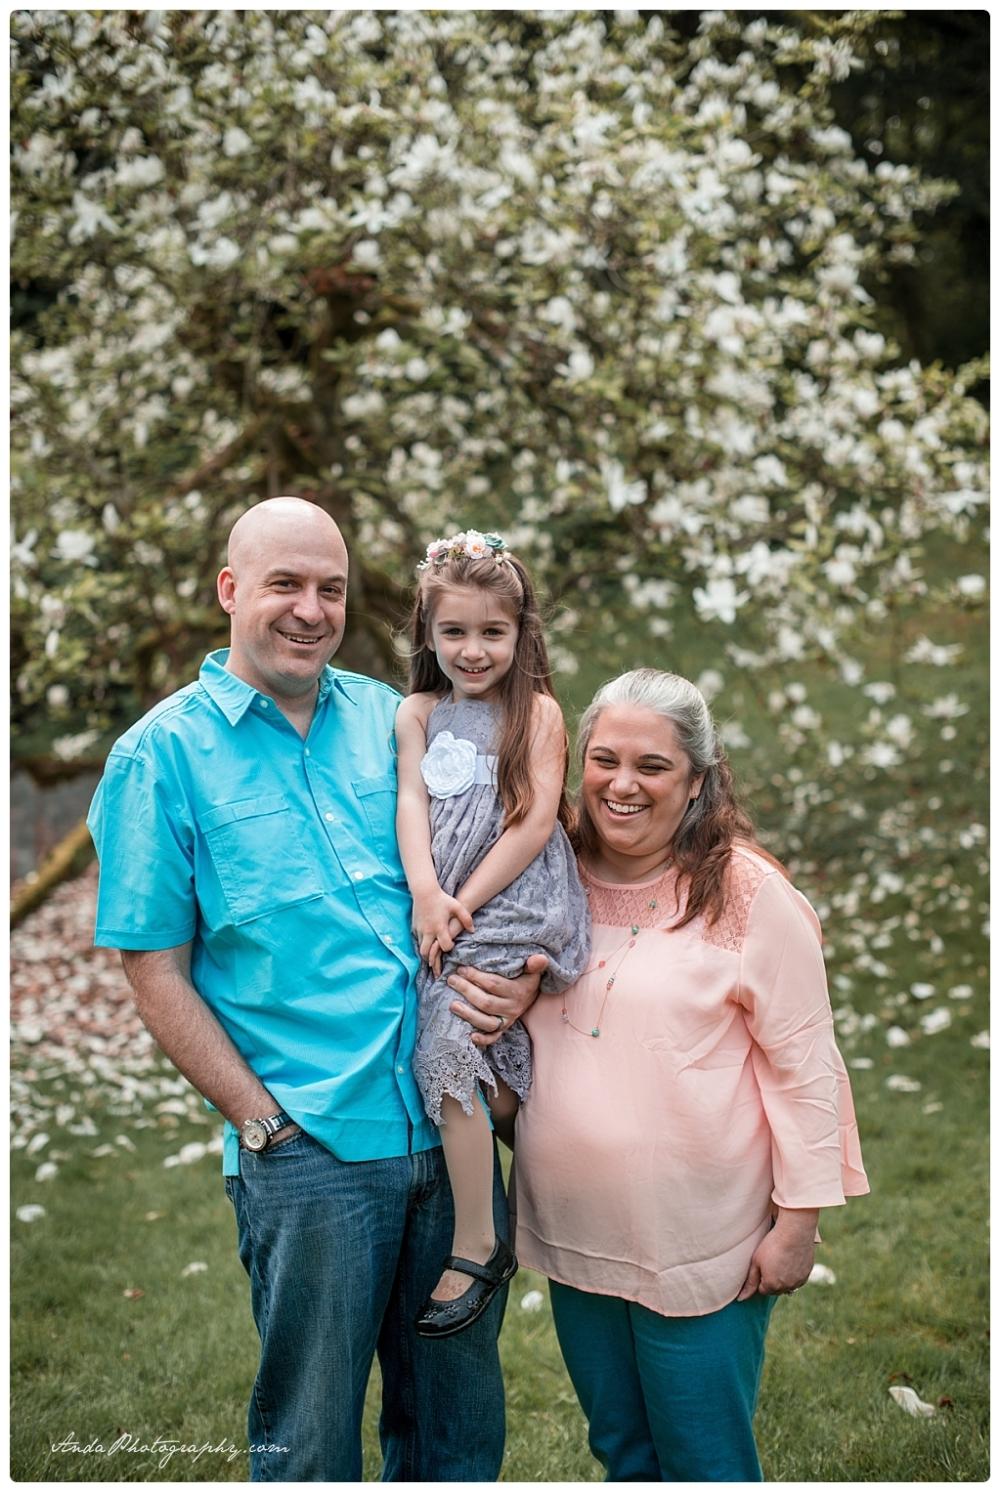 Anda Photography Bellingham family photography Bellingham family photographer bellingahm lifestyle photography woodstock farm photos_0007